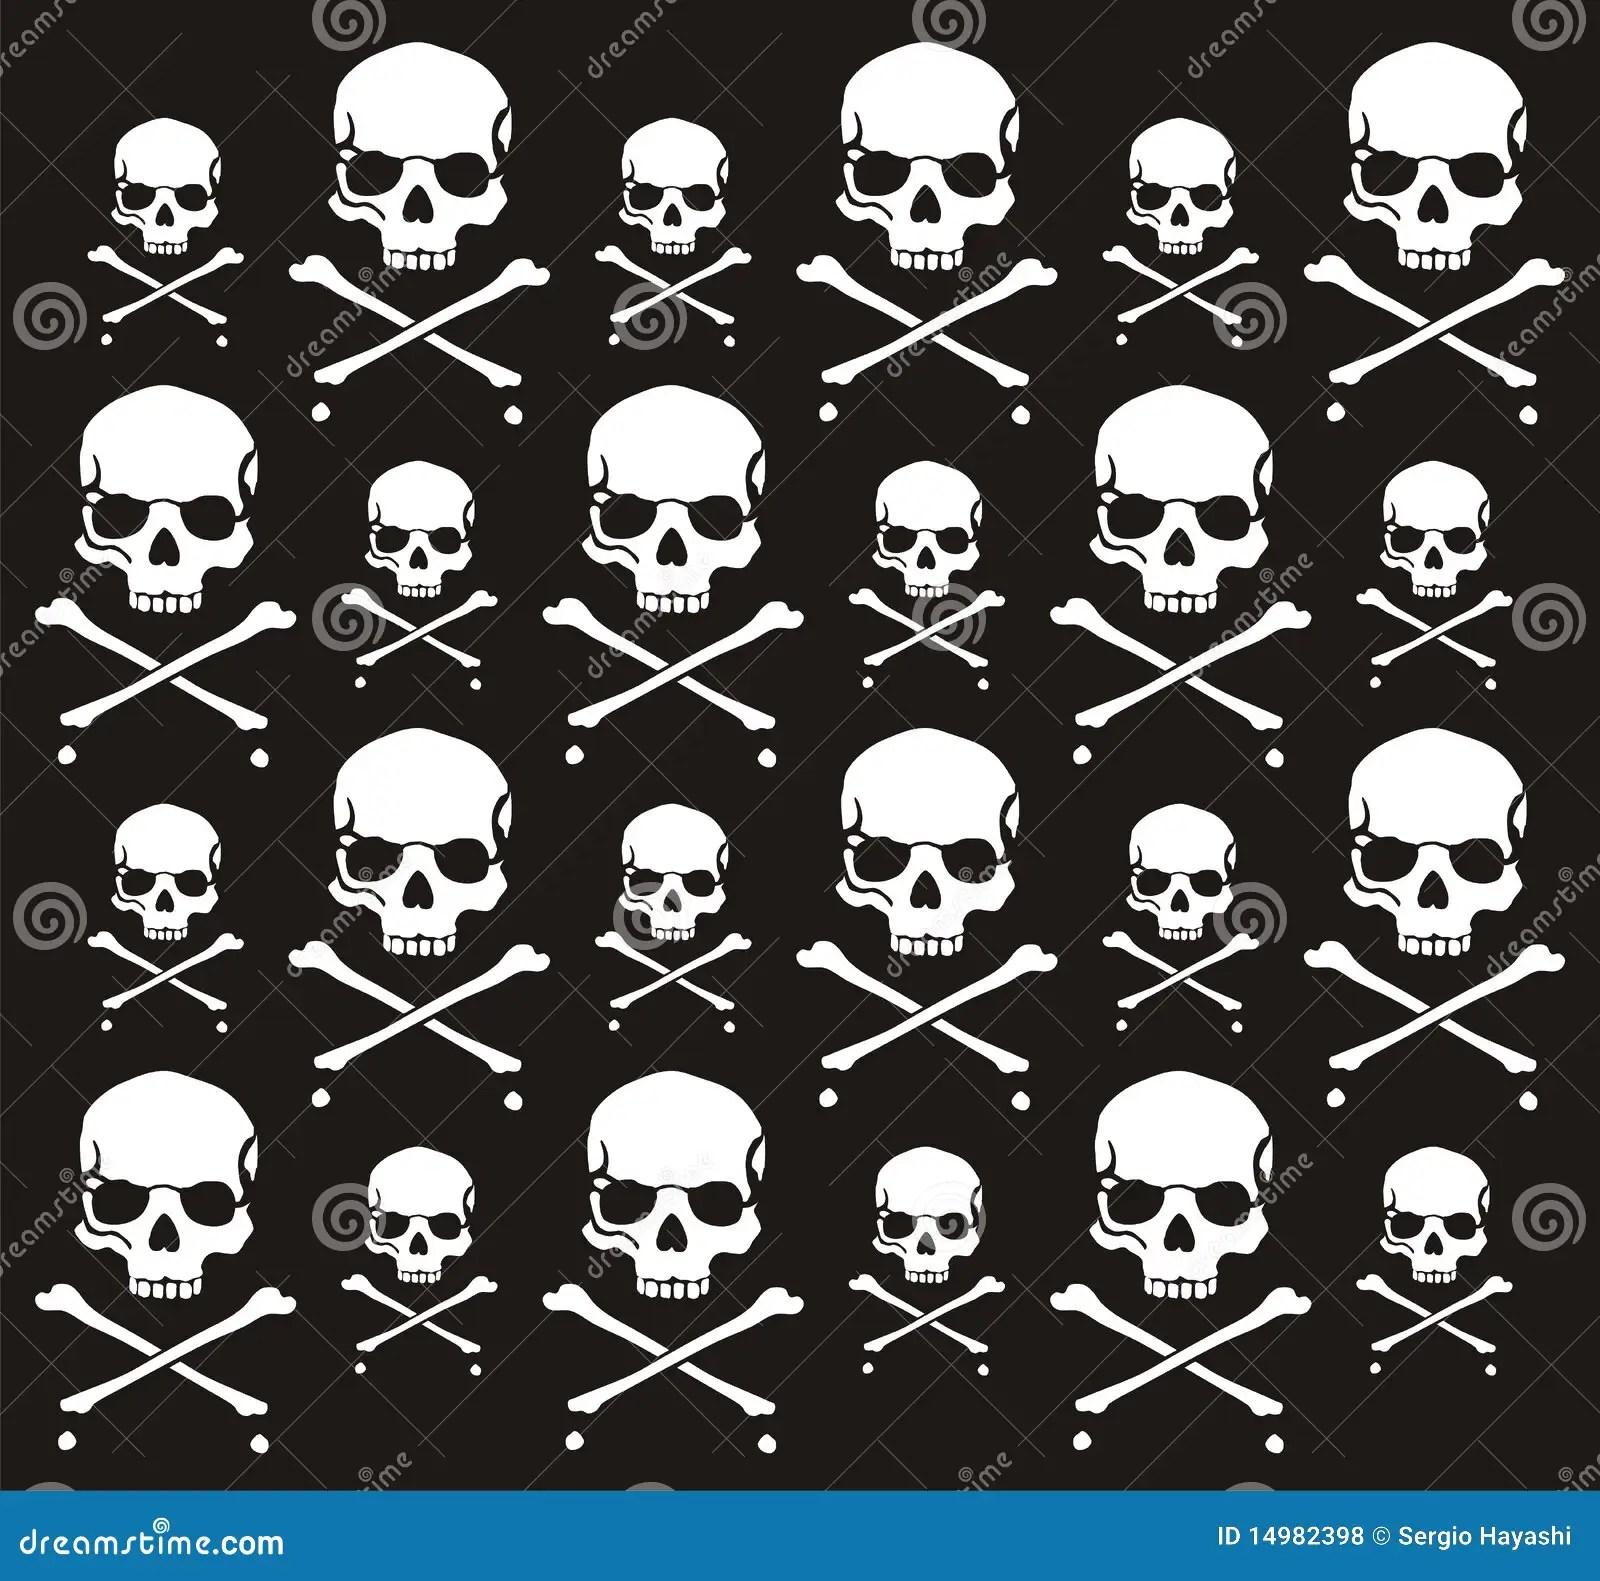 Skeleton Pattern Wallpaper Cute Crossbones And Skull Pattern Royalty Free Stock Photos